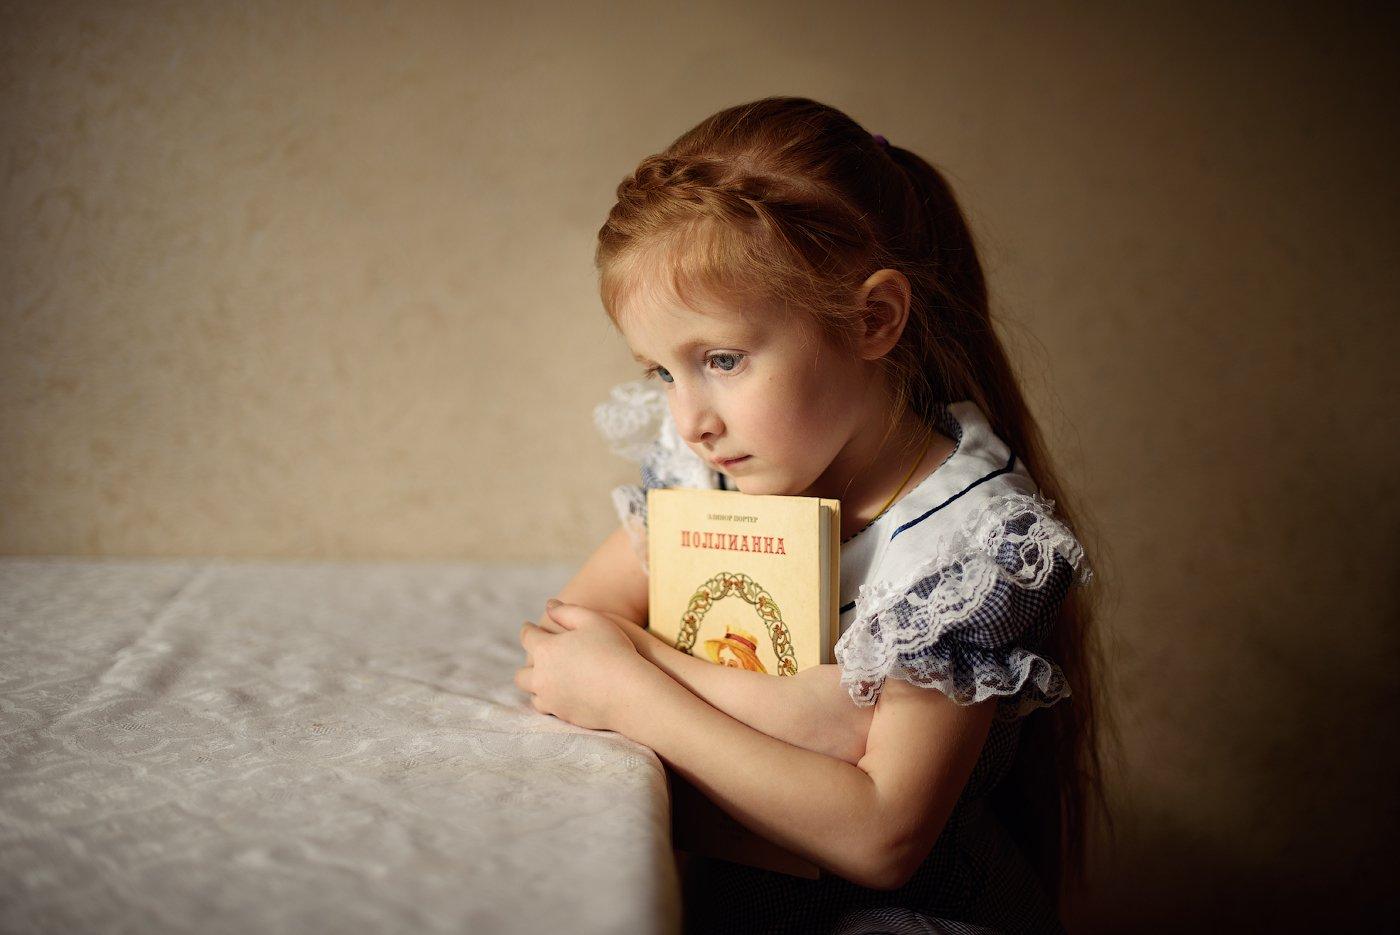 фотограф Колпино, фотограф СПб, детский фотограф Колпино, Юлия Полуэктова